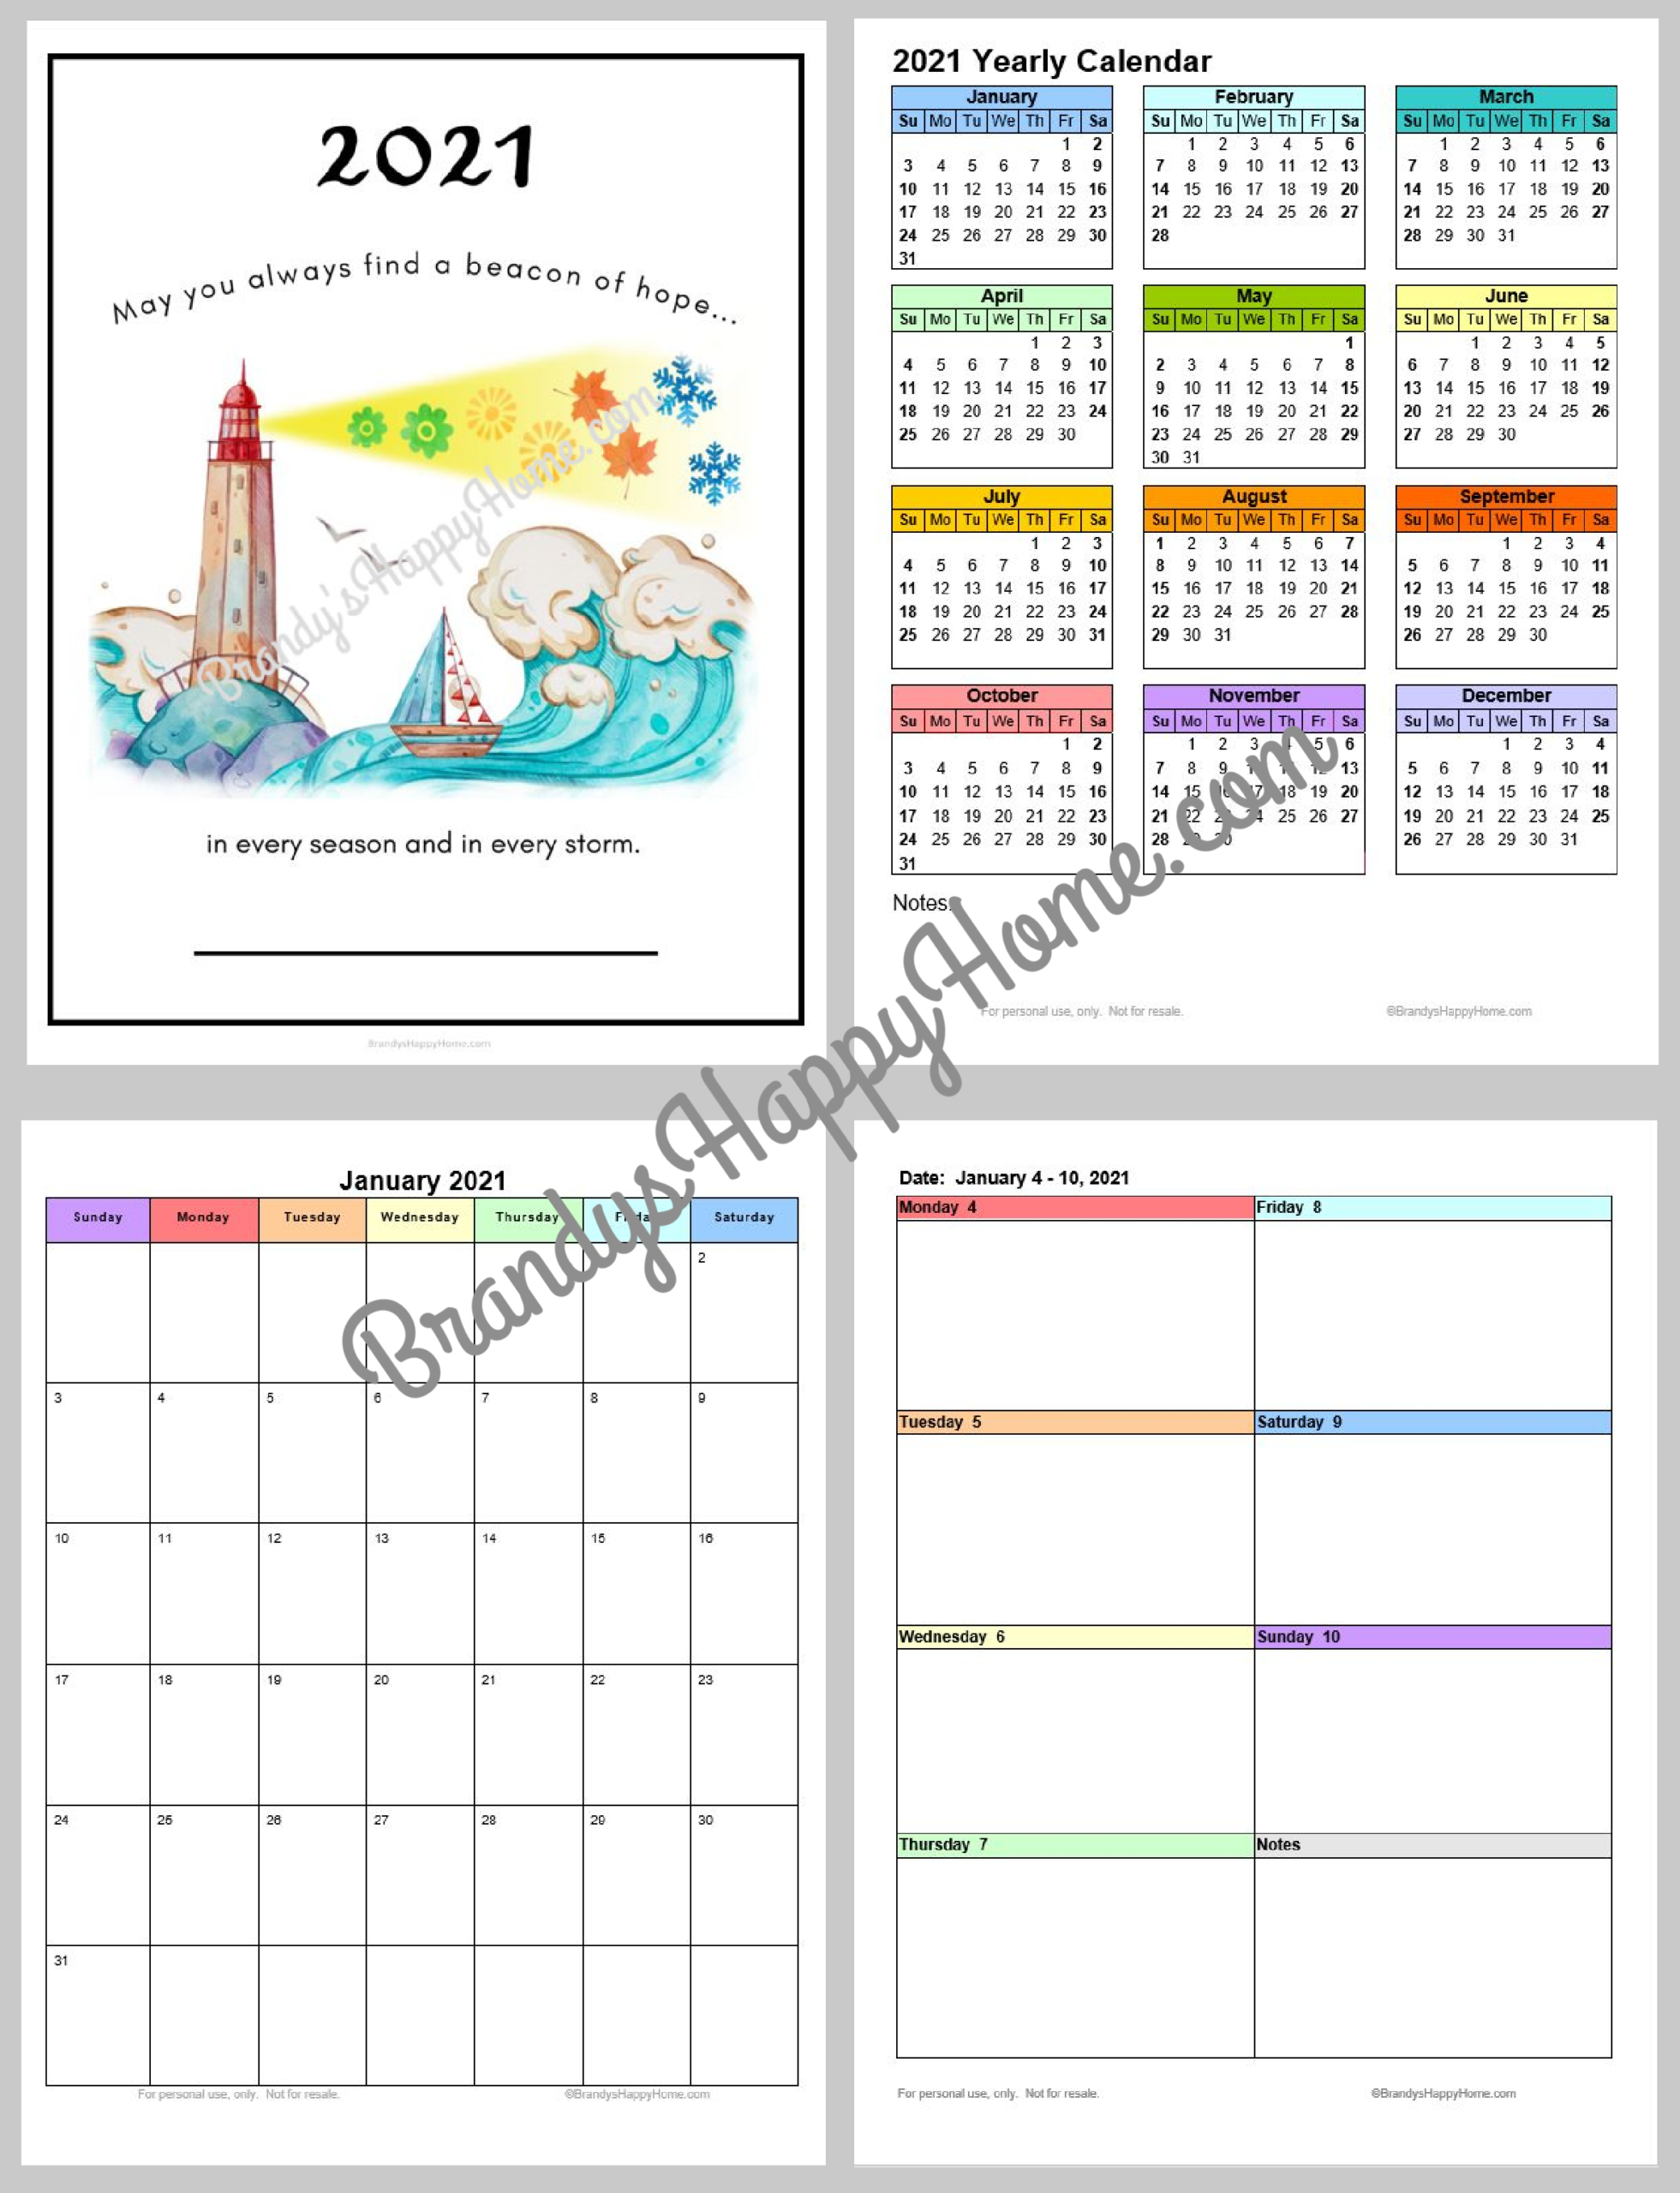 Free 2021 Calendar Planner Printables inside 2021-2021: 2-Year Planner 24-Monthly